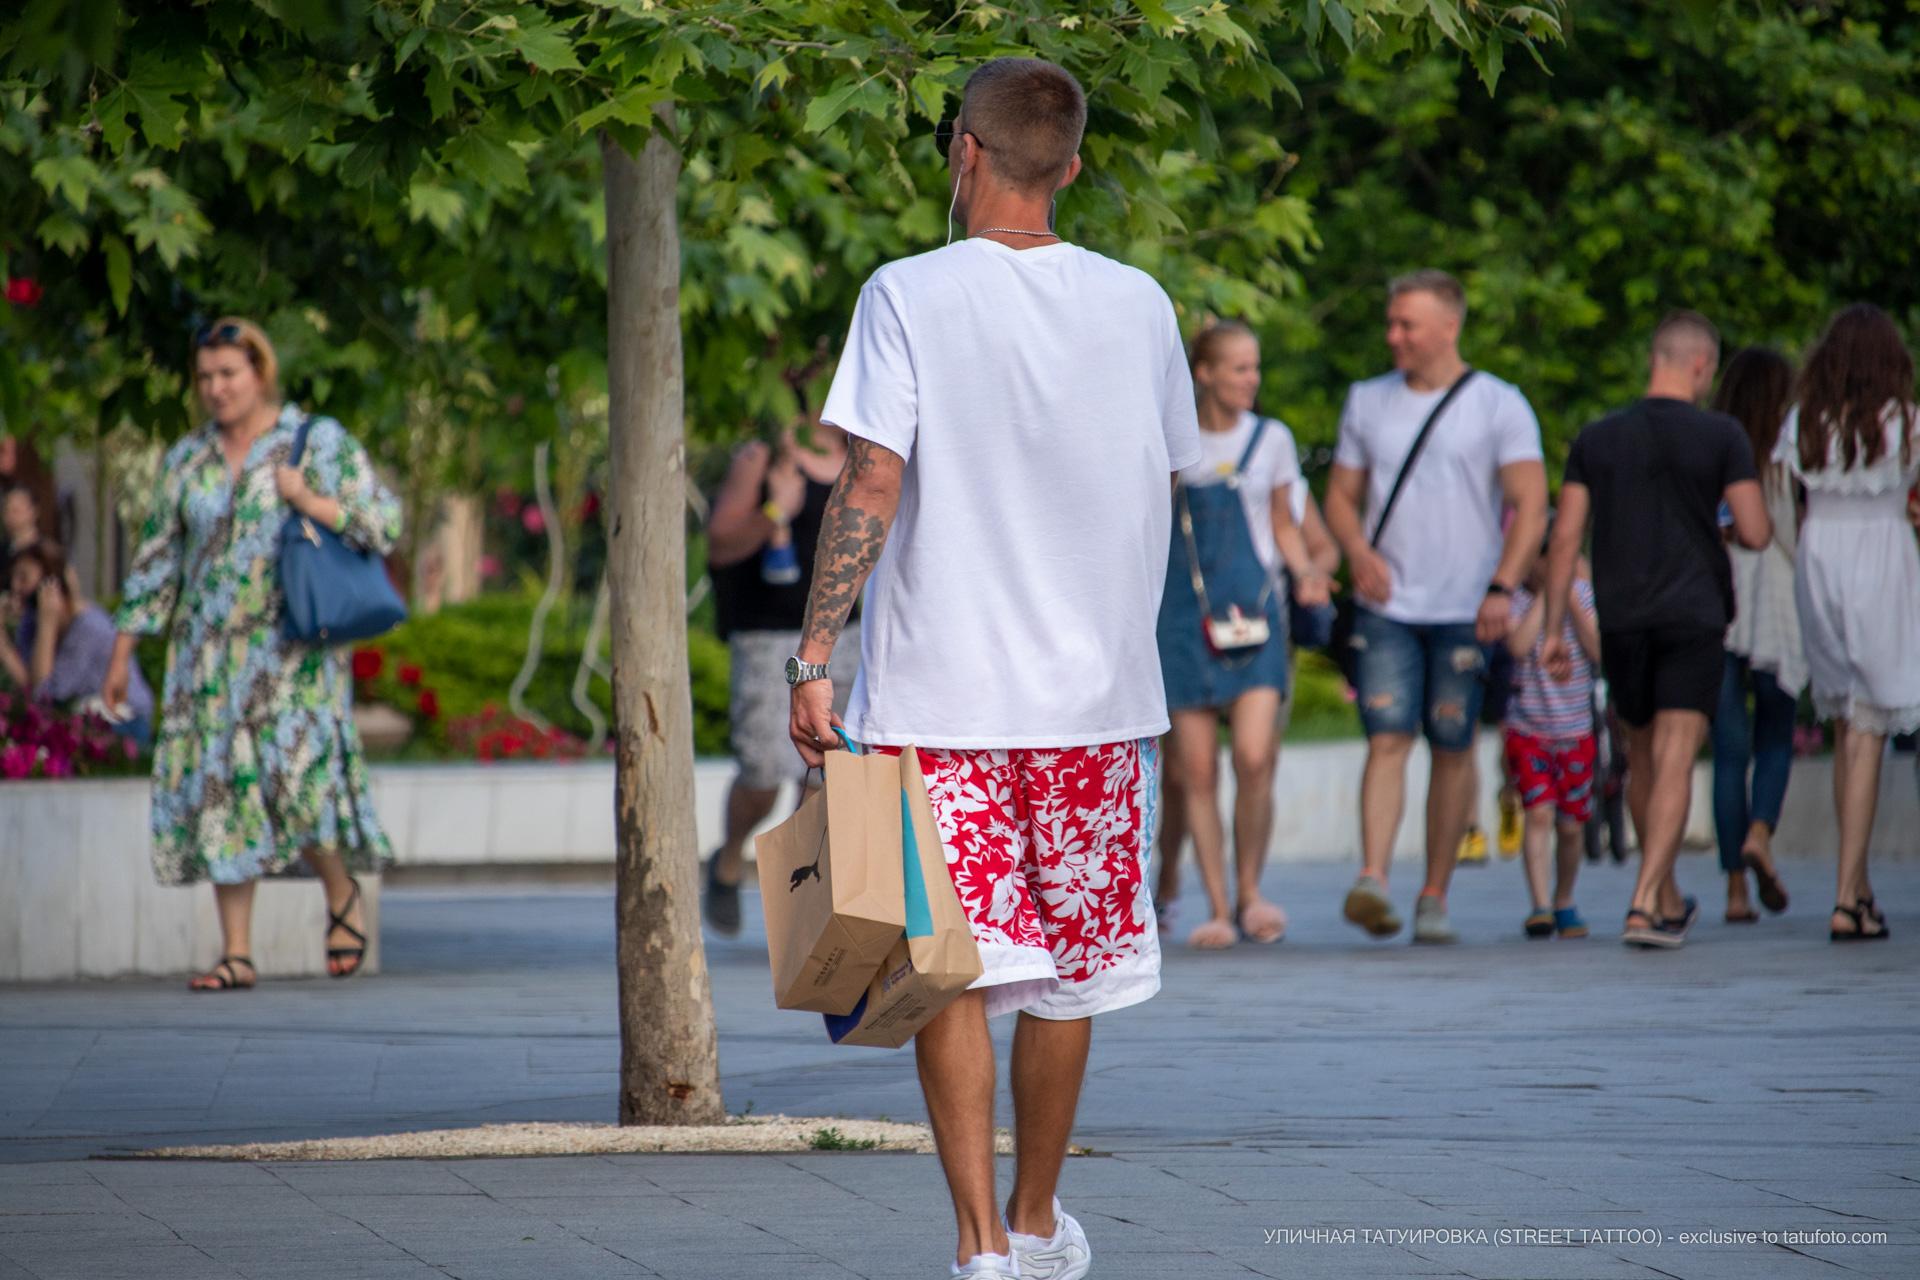 Фото тату с тучками на руке парня - Уличная татуировка (street tattoo) № 06 – 18.06.2020 – tatufoto.com 1